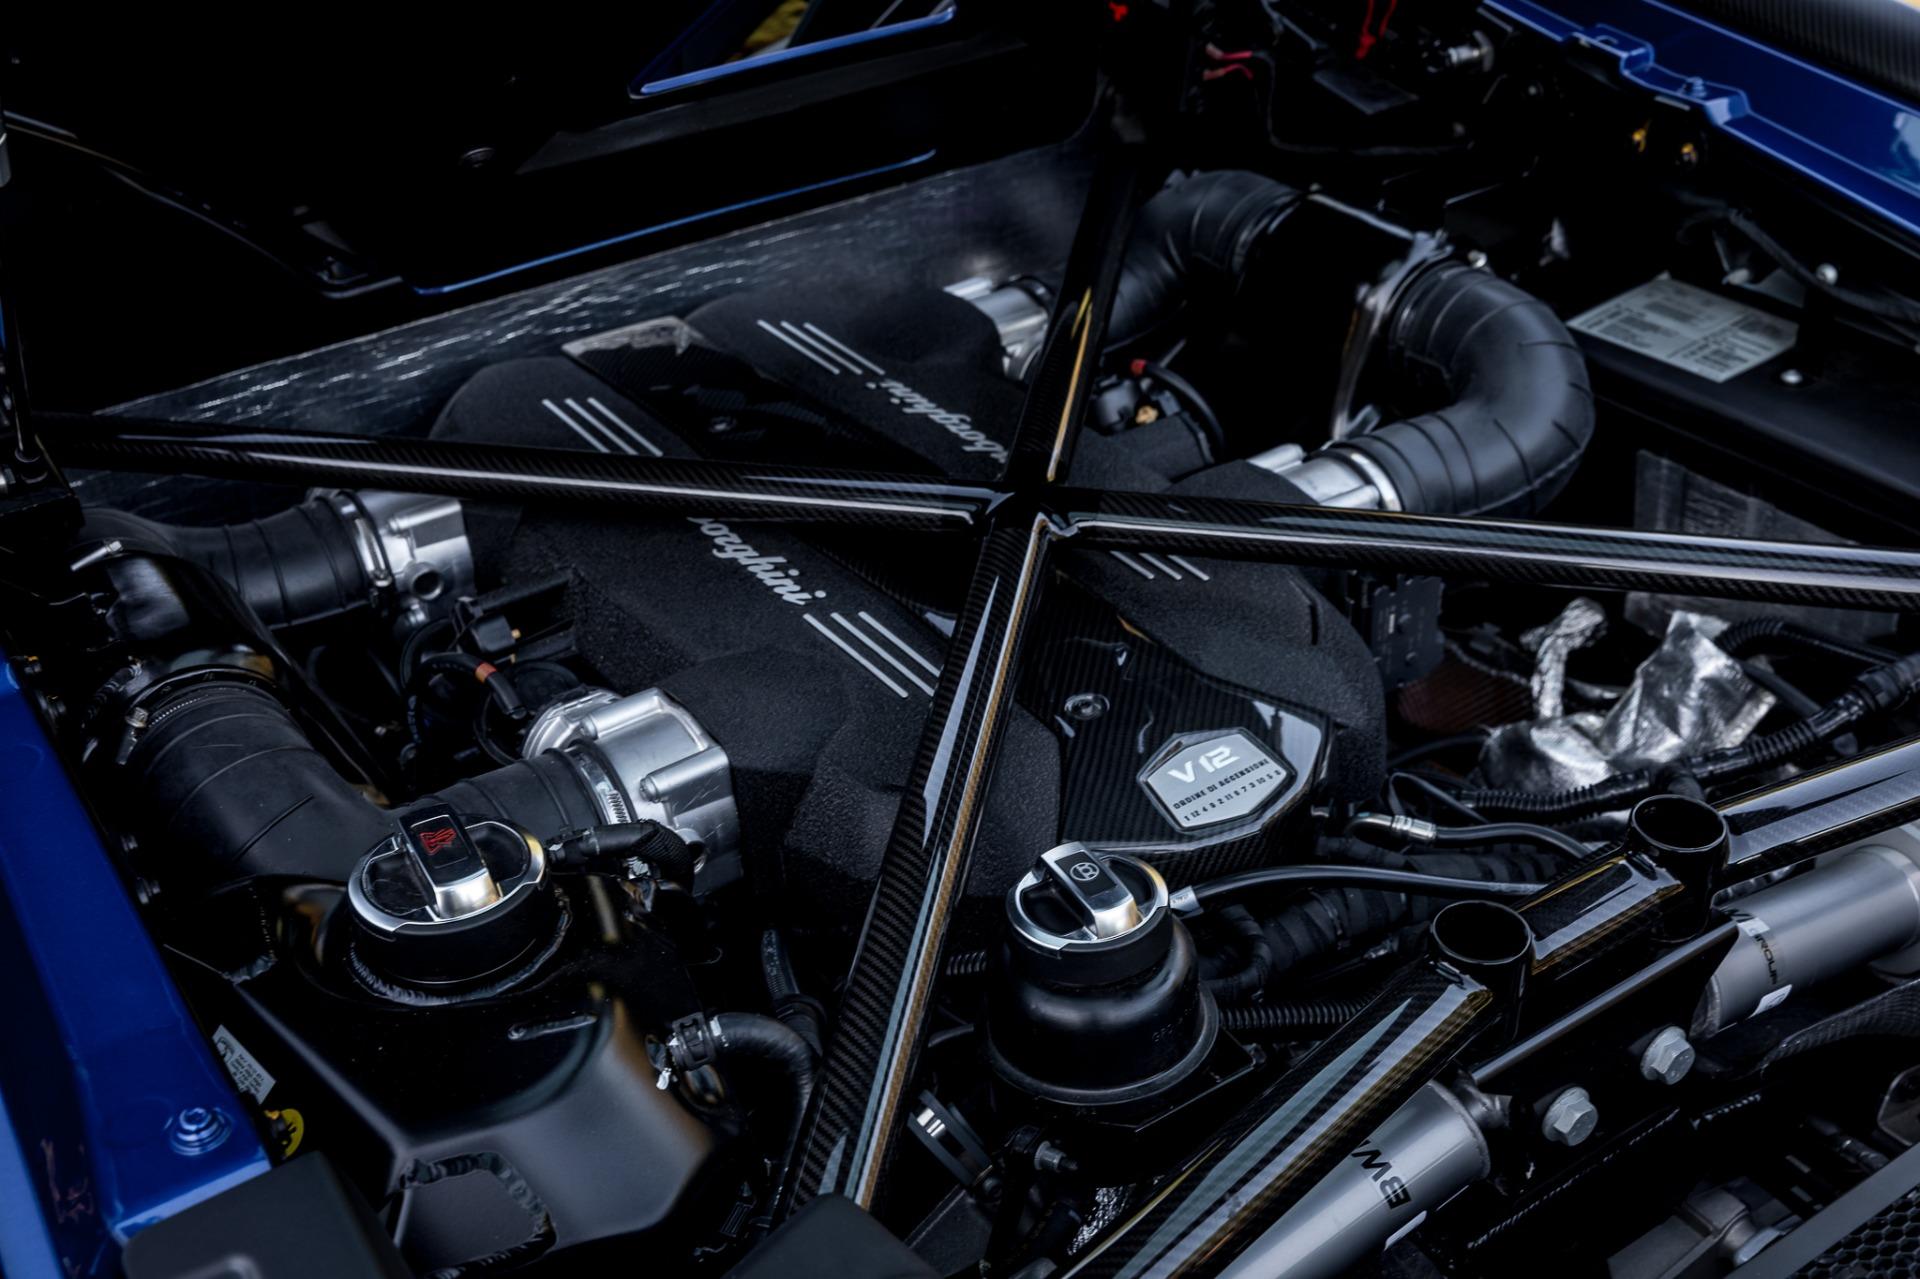 Used 2017 Lamborghini Aventador LP 750-4 SV / 740HP / AWD / 1930 MI / NAV / CAMERA for sale Sold at Formula Imports in Charlotte NC 28227 71